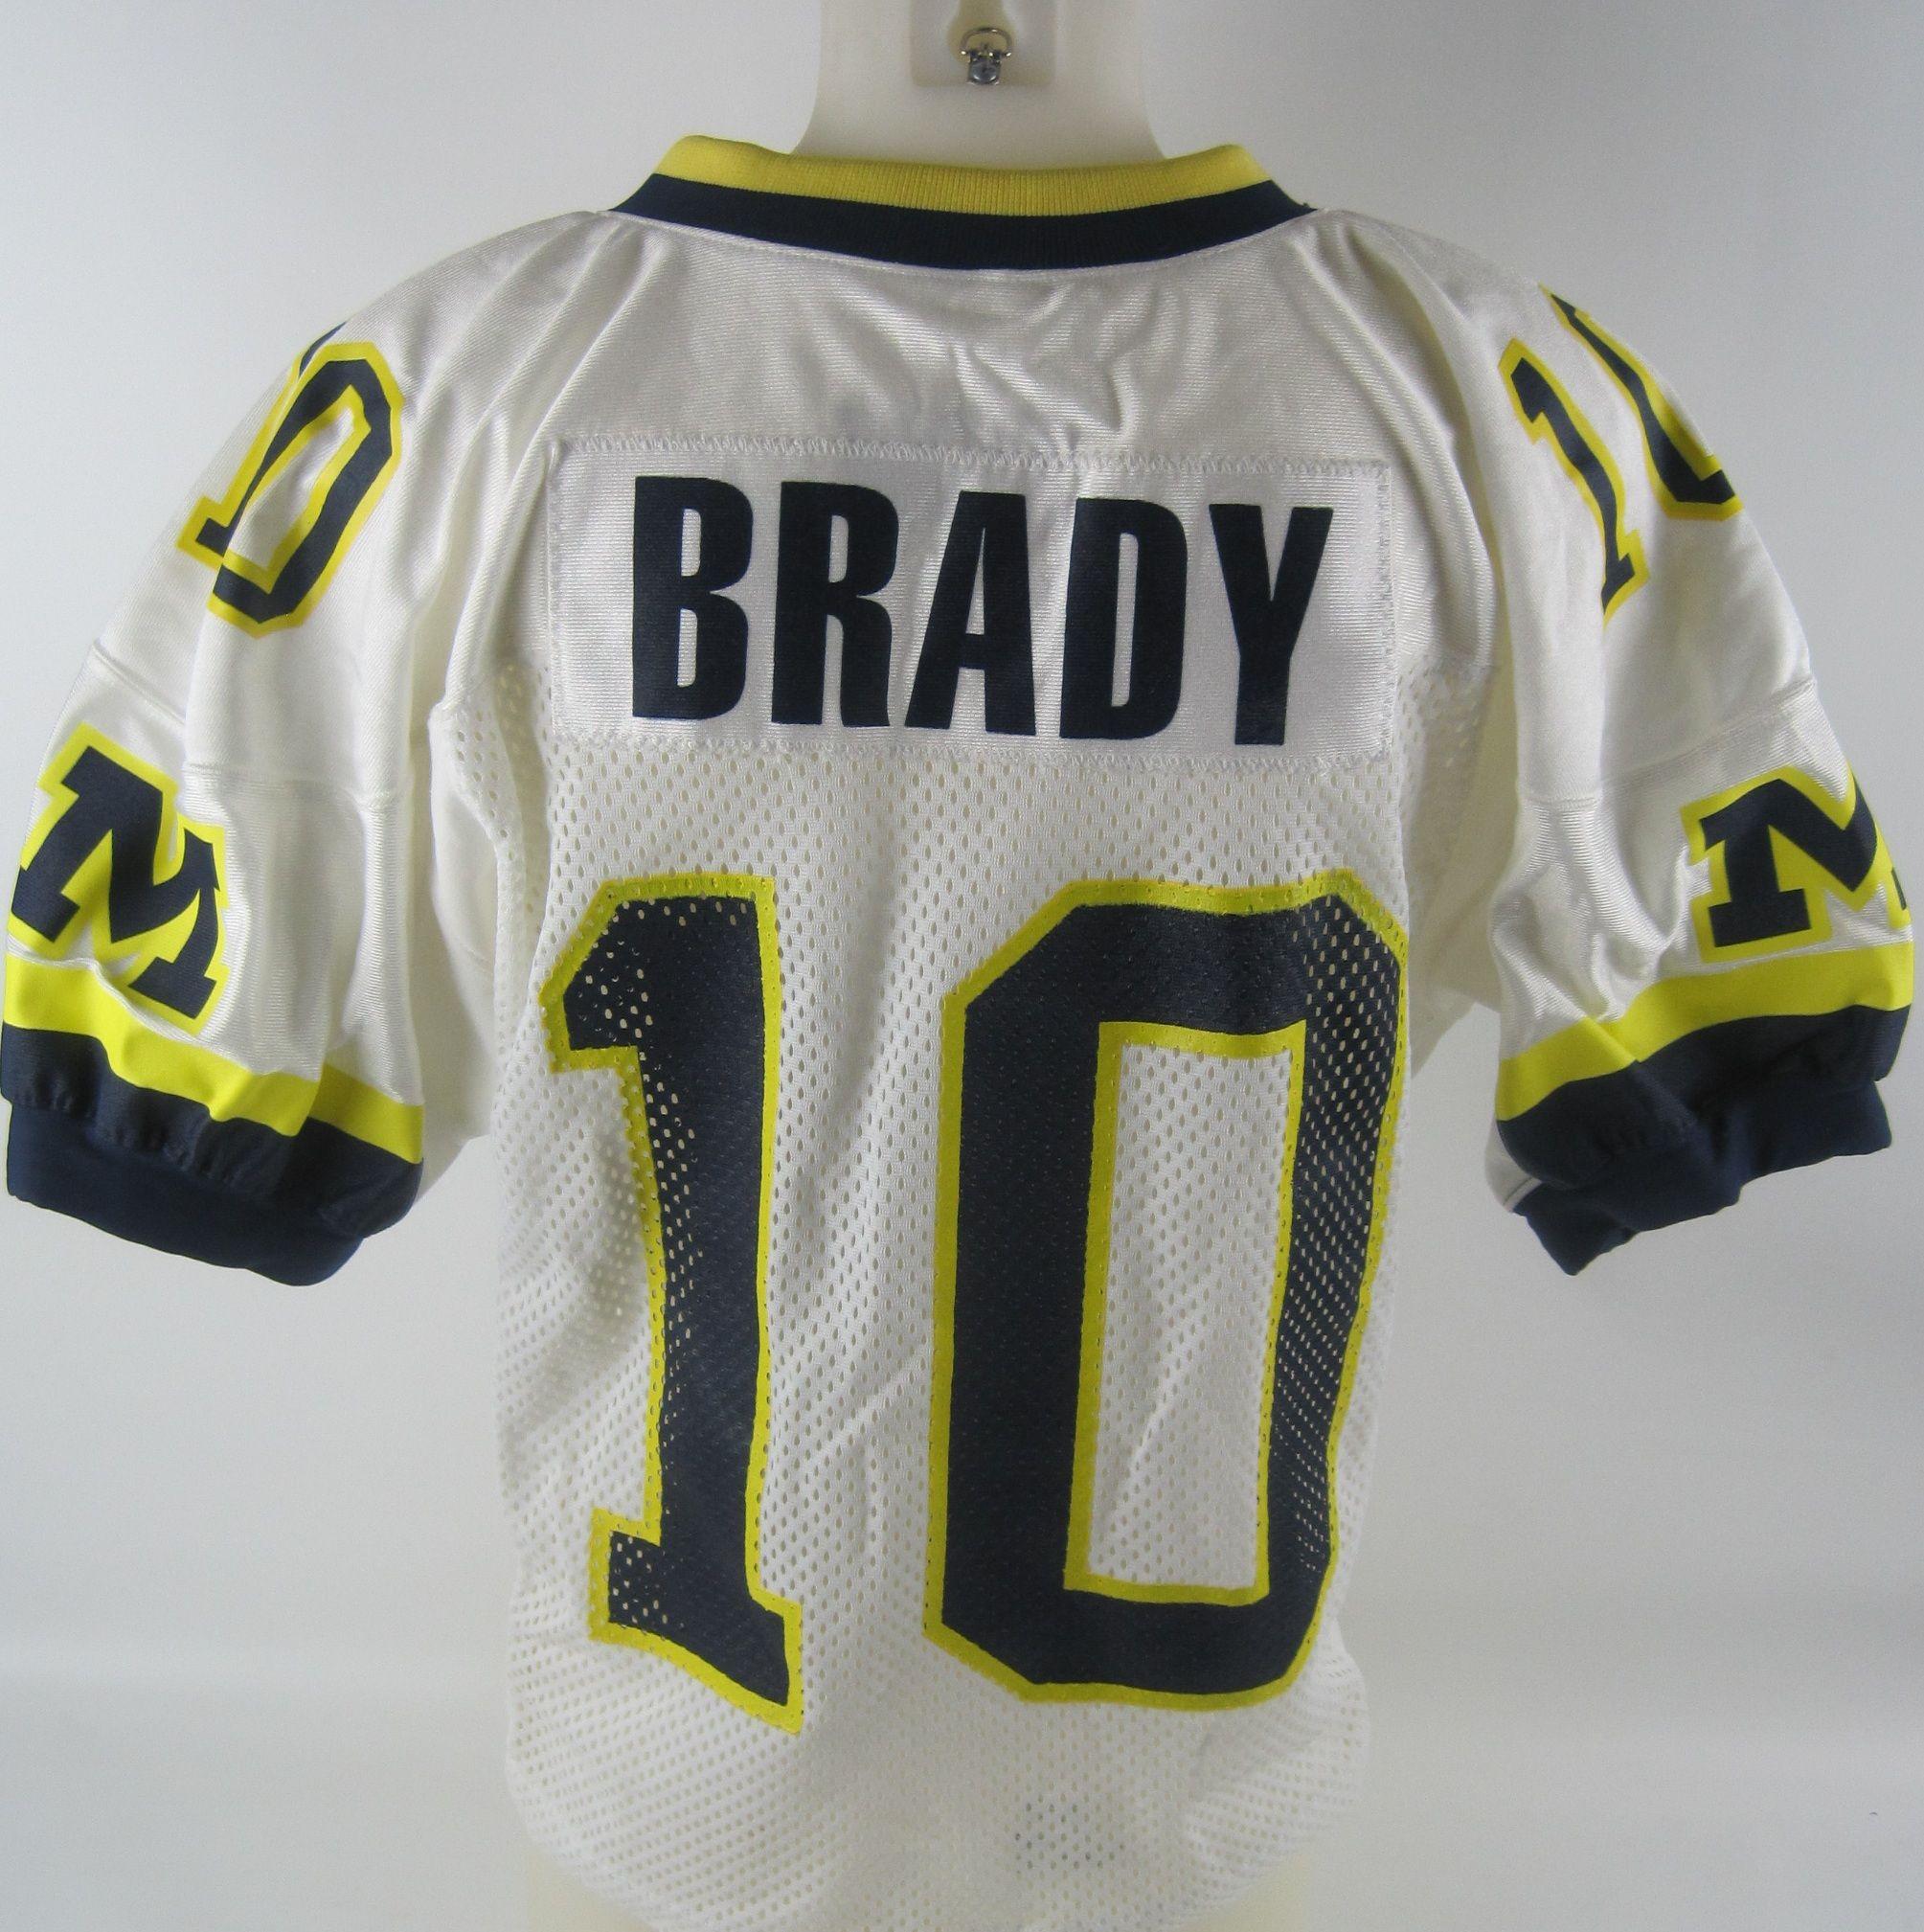 tom brady's jersey number at michigan